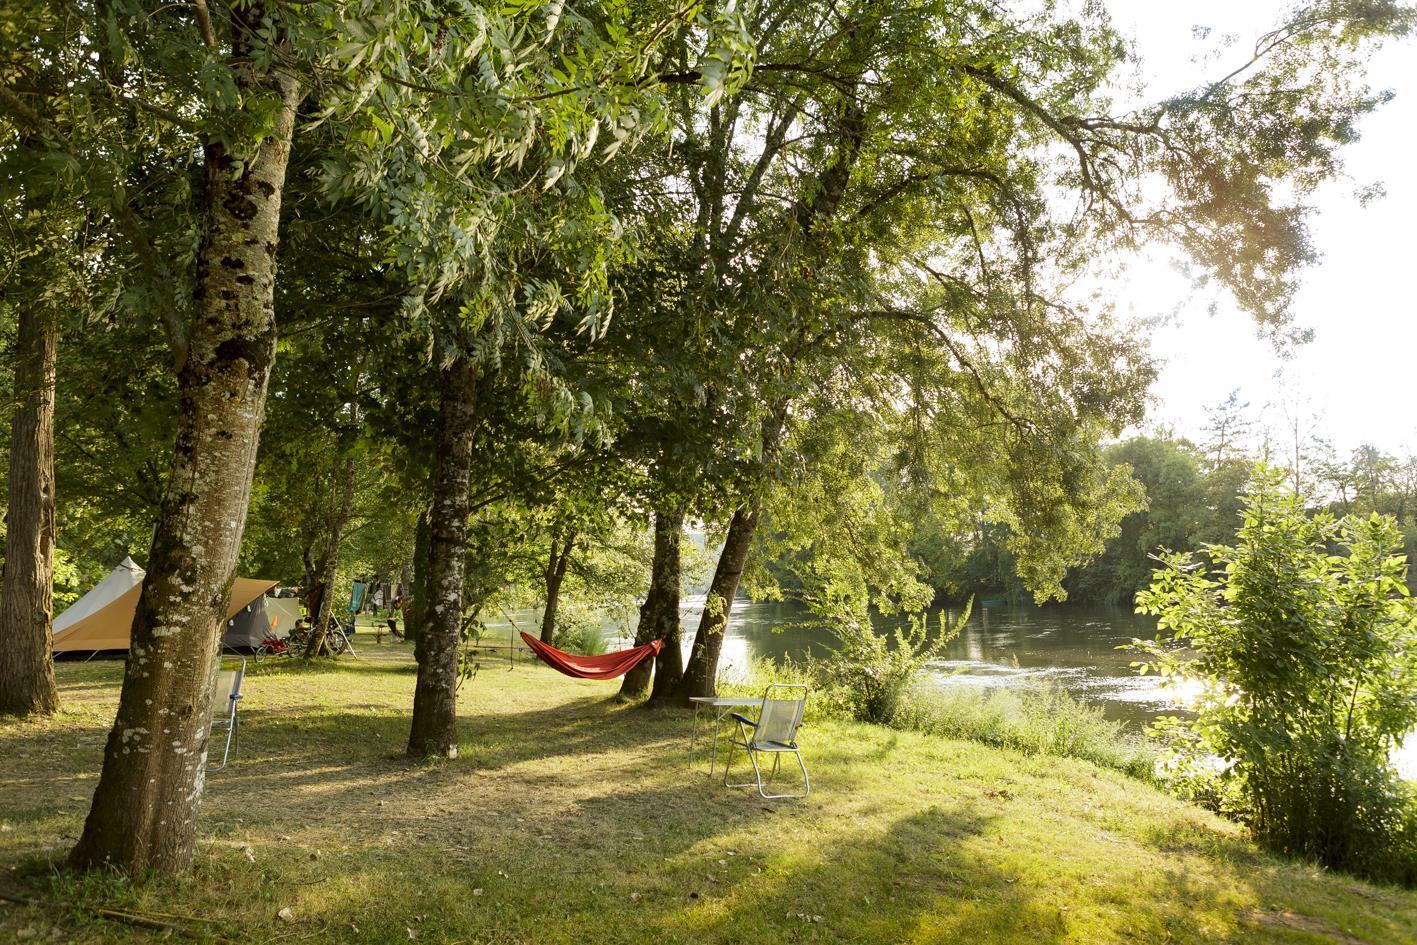 Camping le Clos Bouyssac, Touzac, Lot